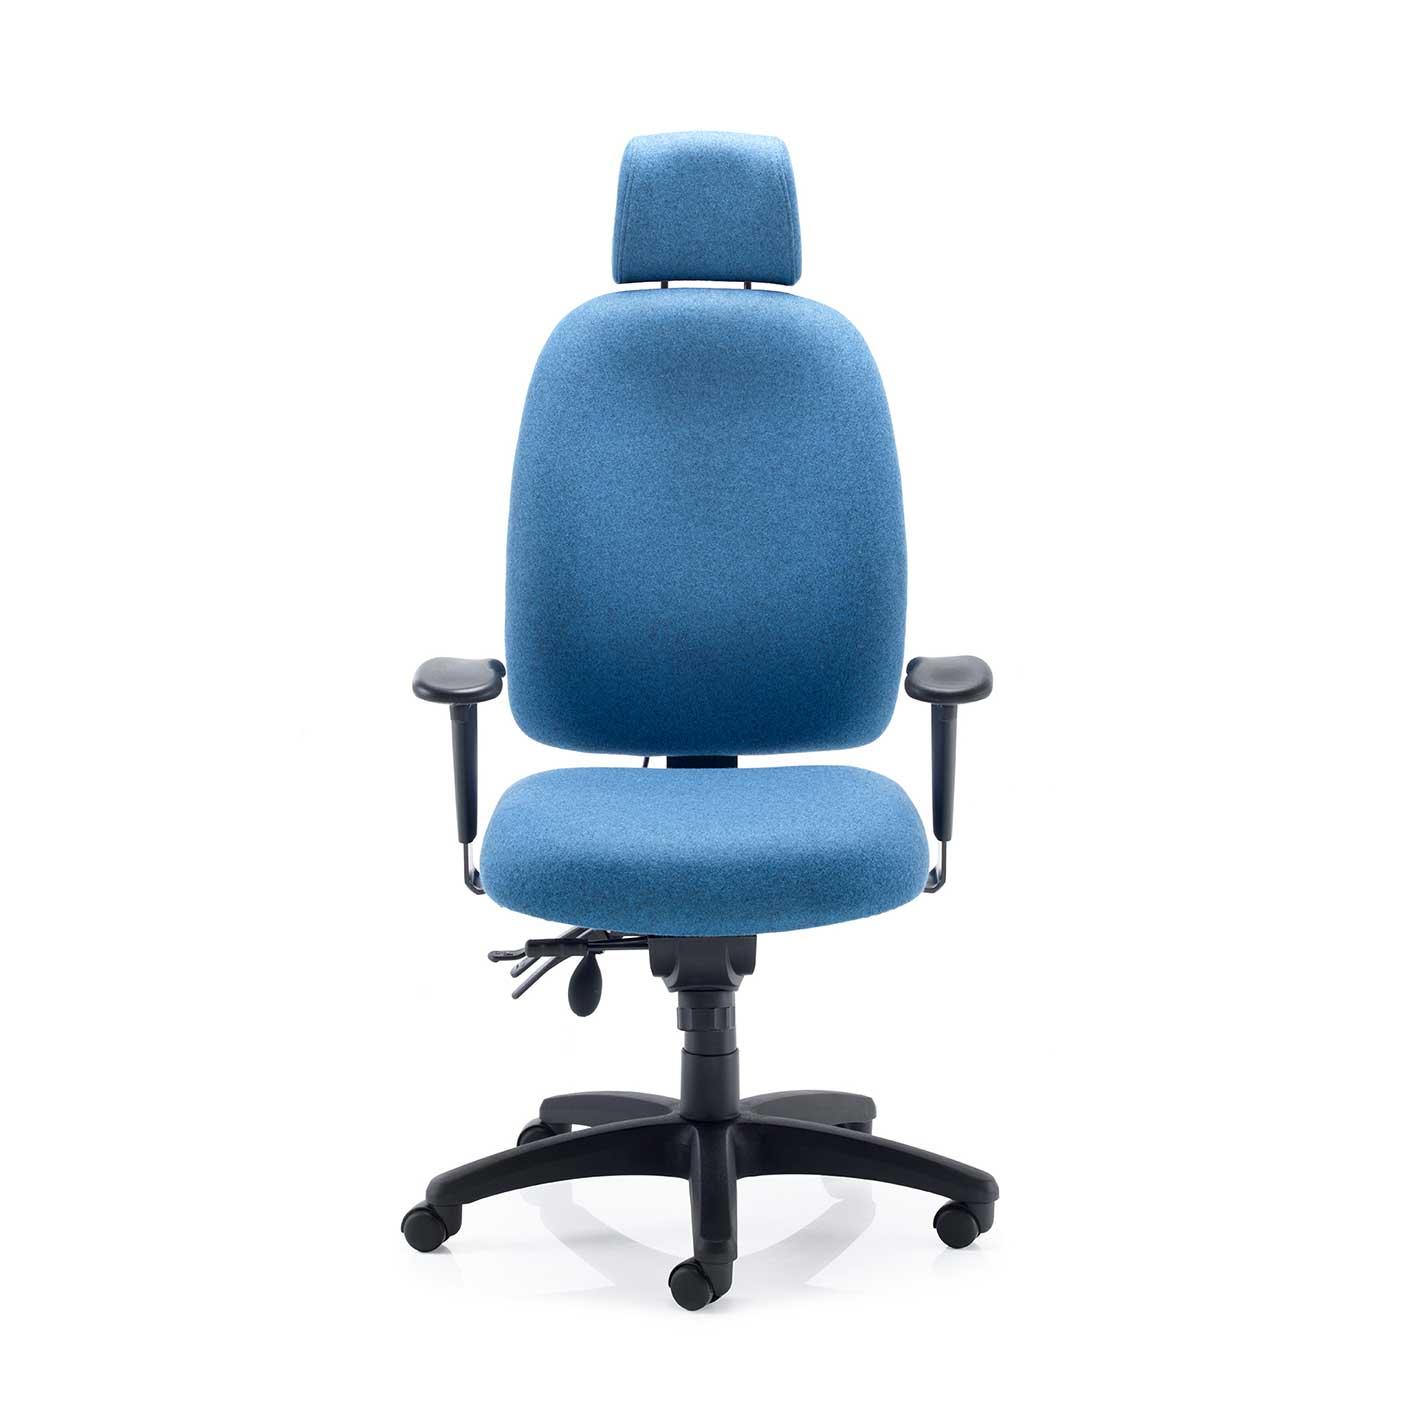 Blue Ergonomic chair stellar posture from Psi in blue